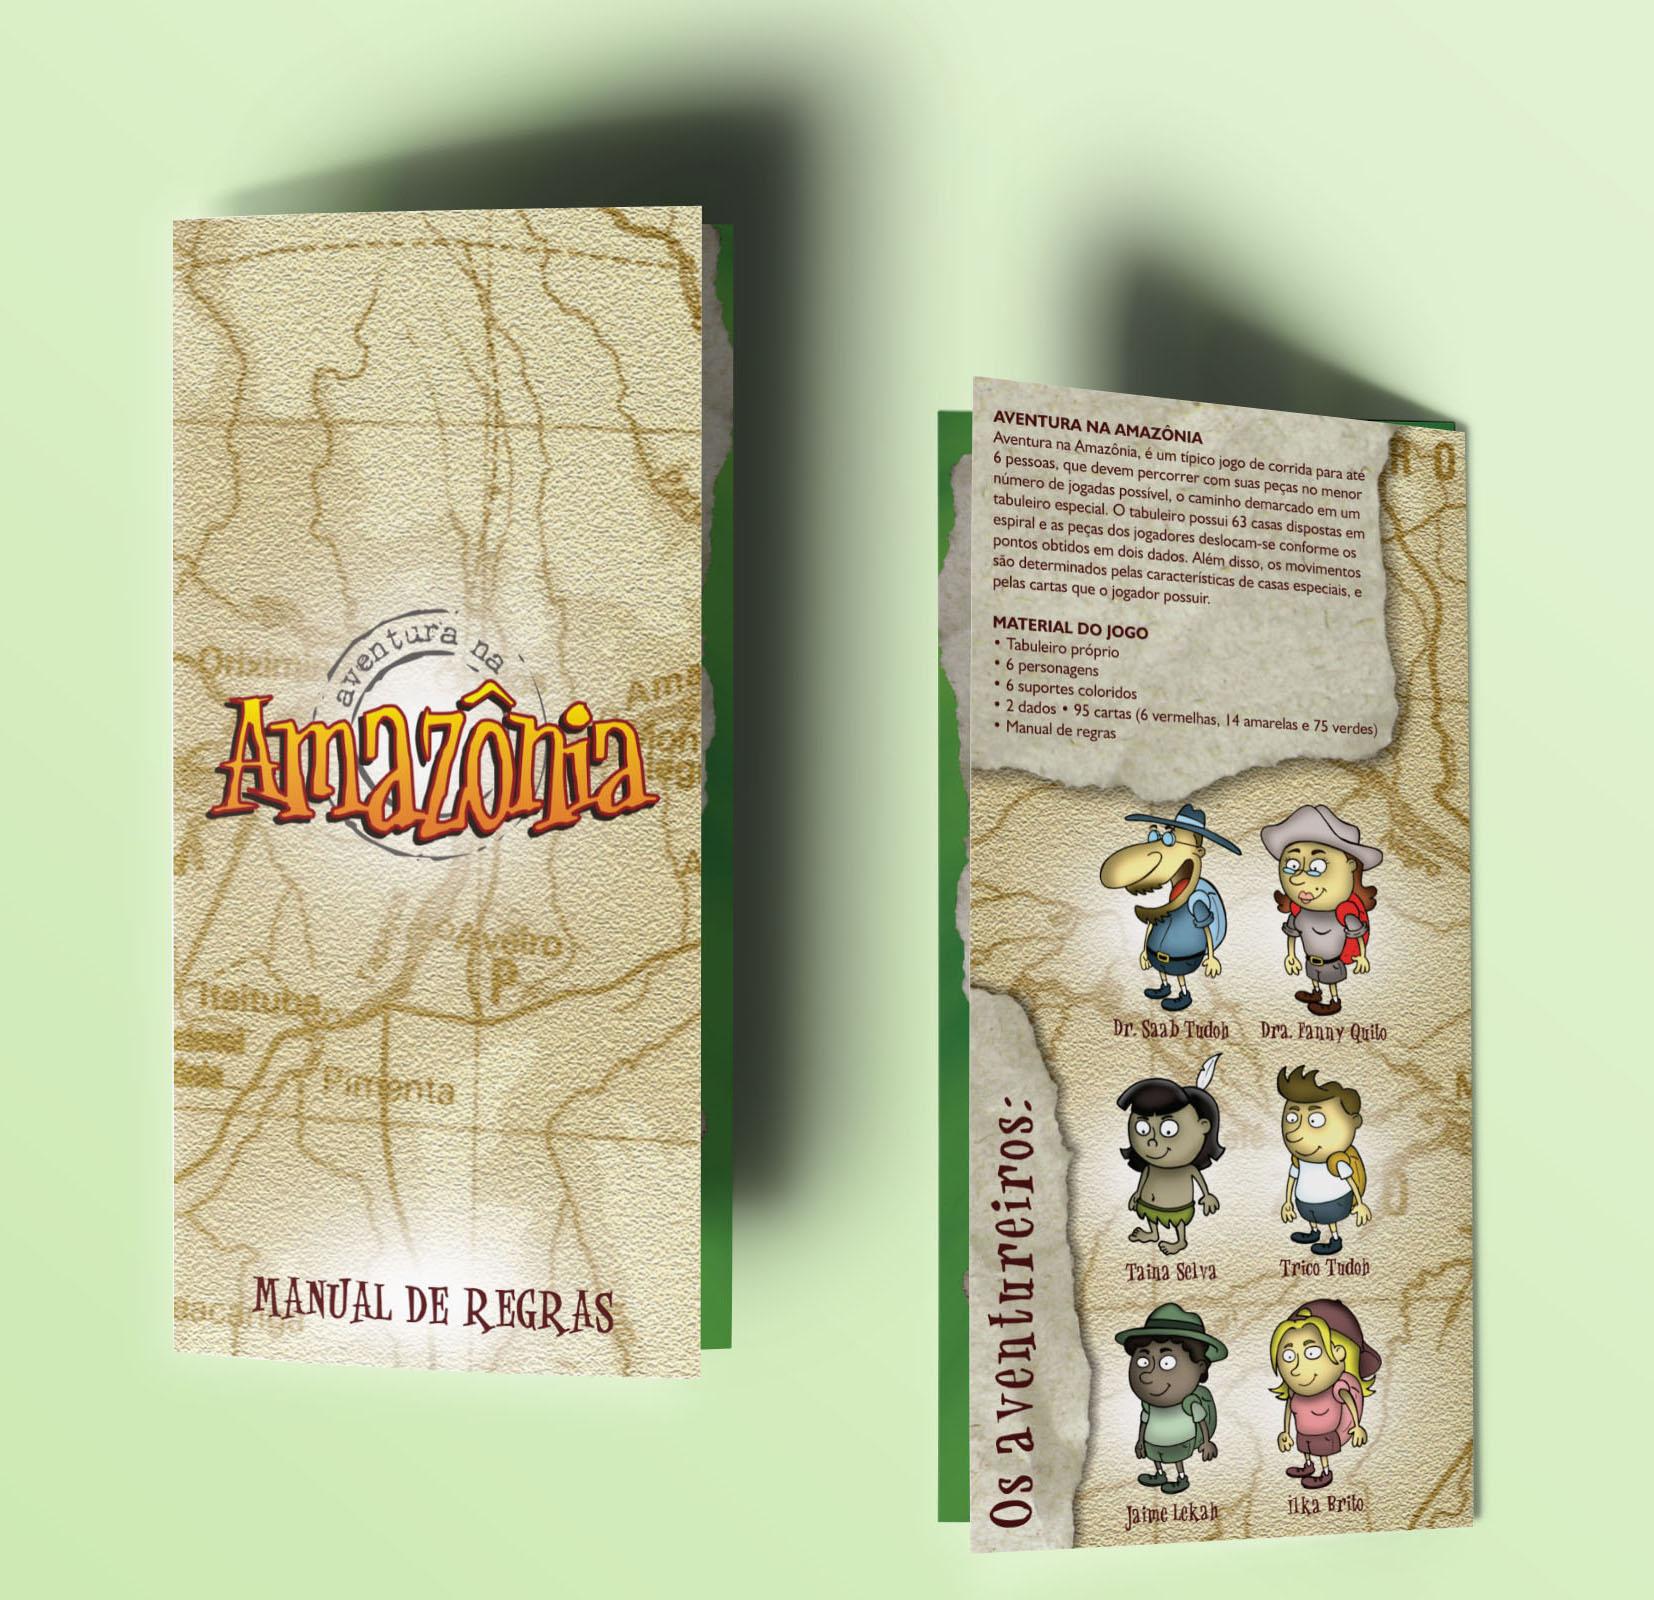 aventura-amazonia-apresentacao-manual-regras